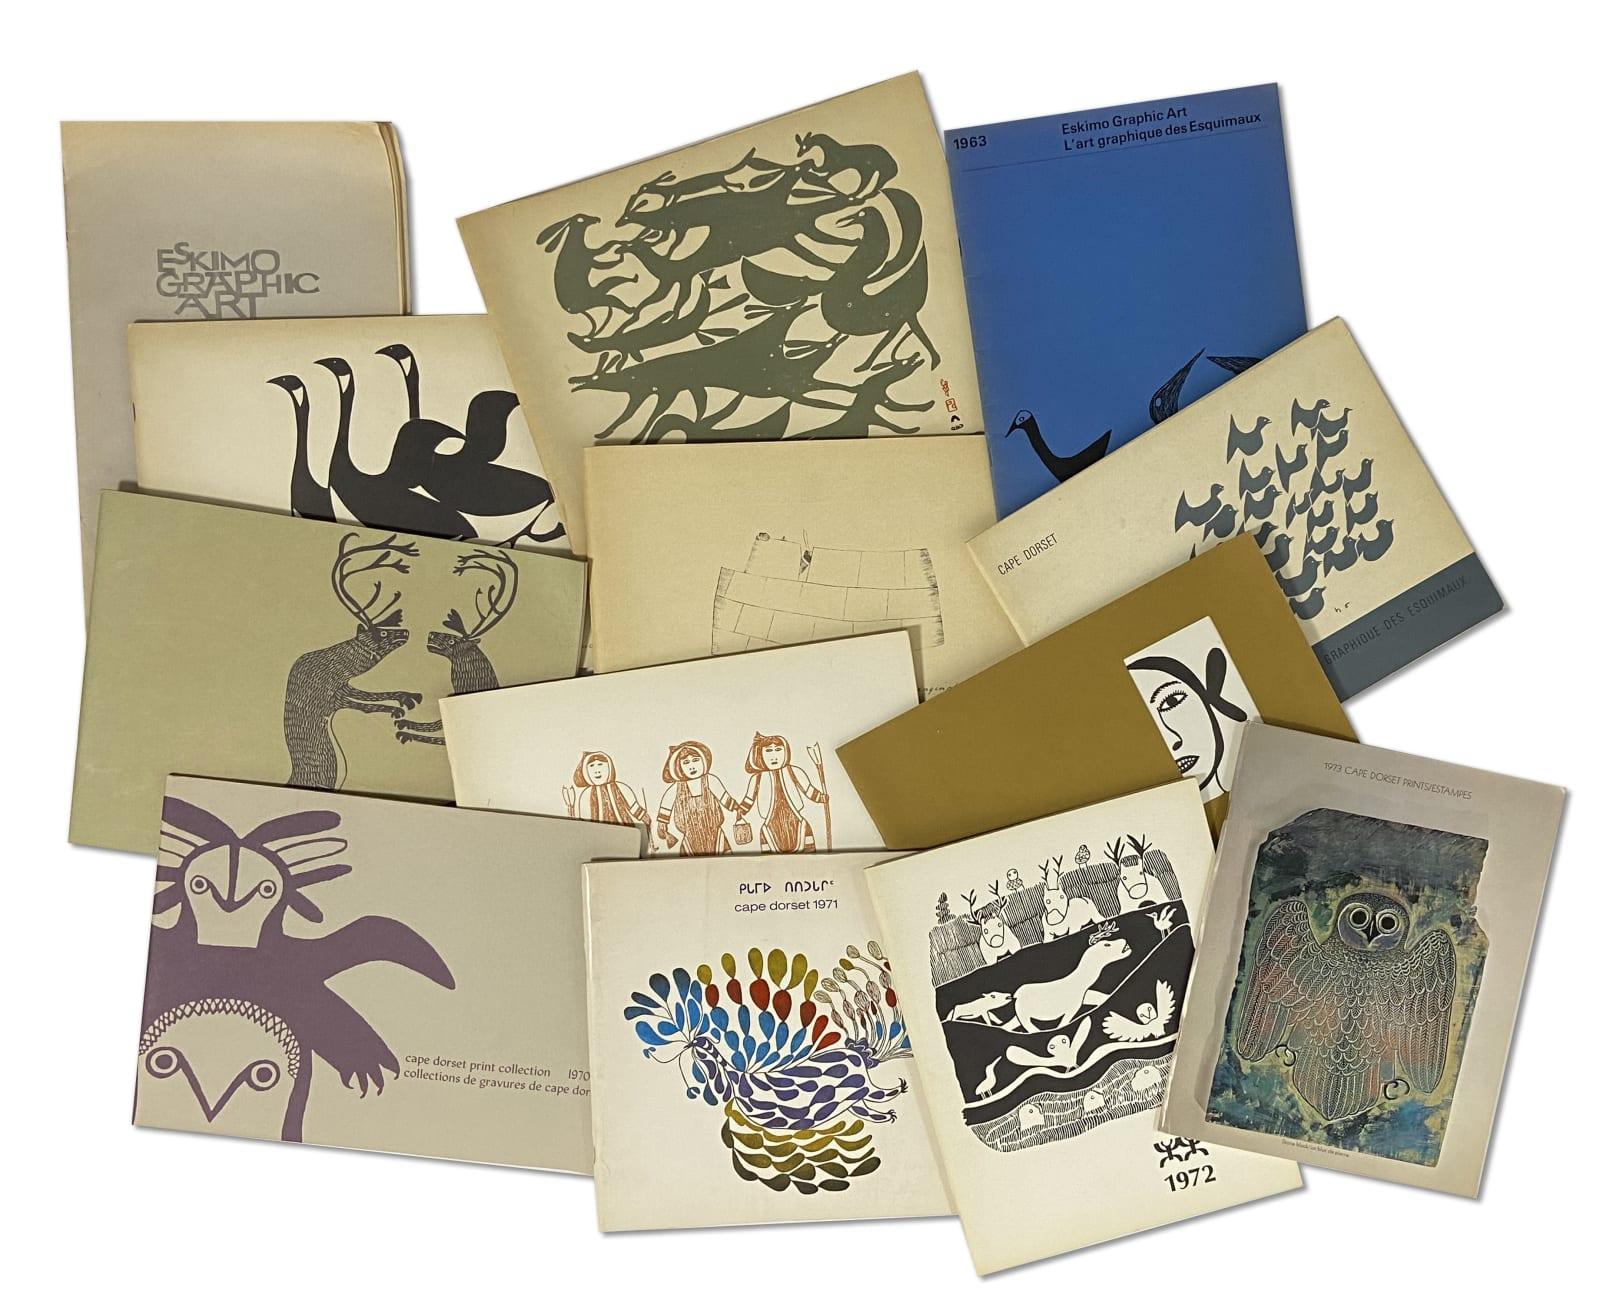 Lot 83 Quantity of Cape Dorset Annual Print Catalogues Estimate: $150 — $250 PRICE REALIZED: $600